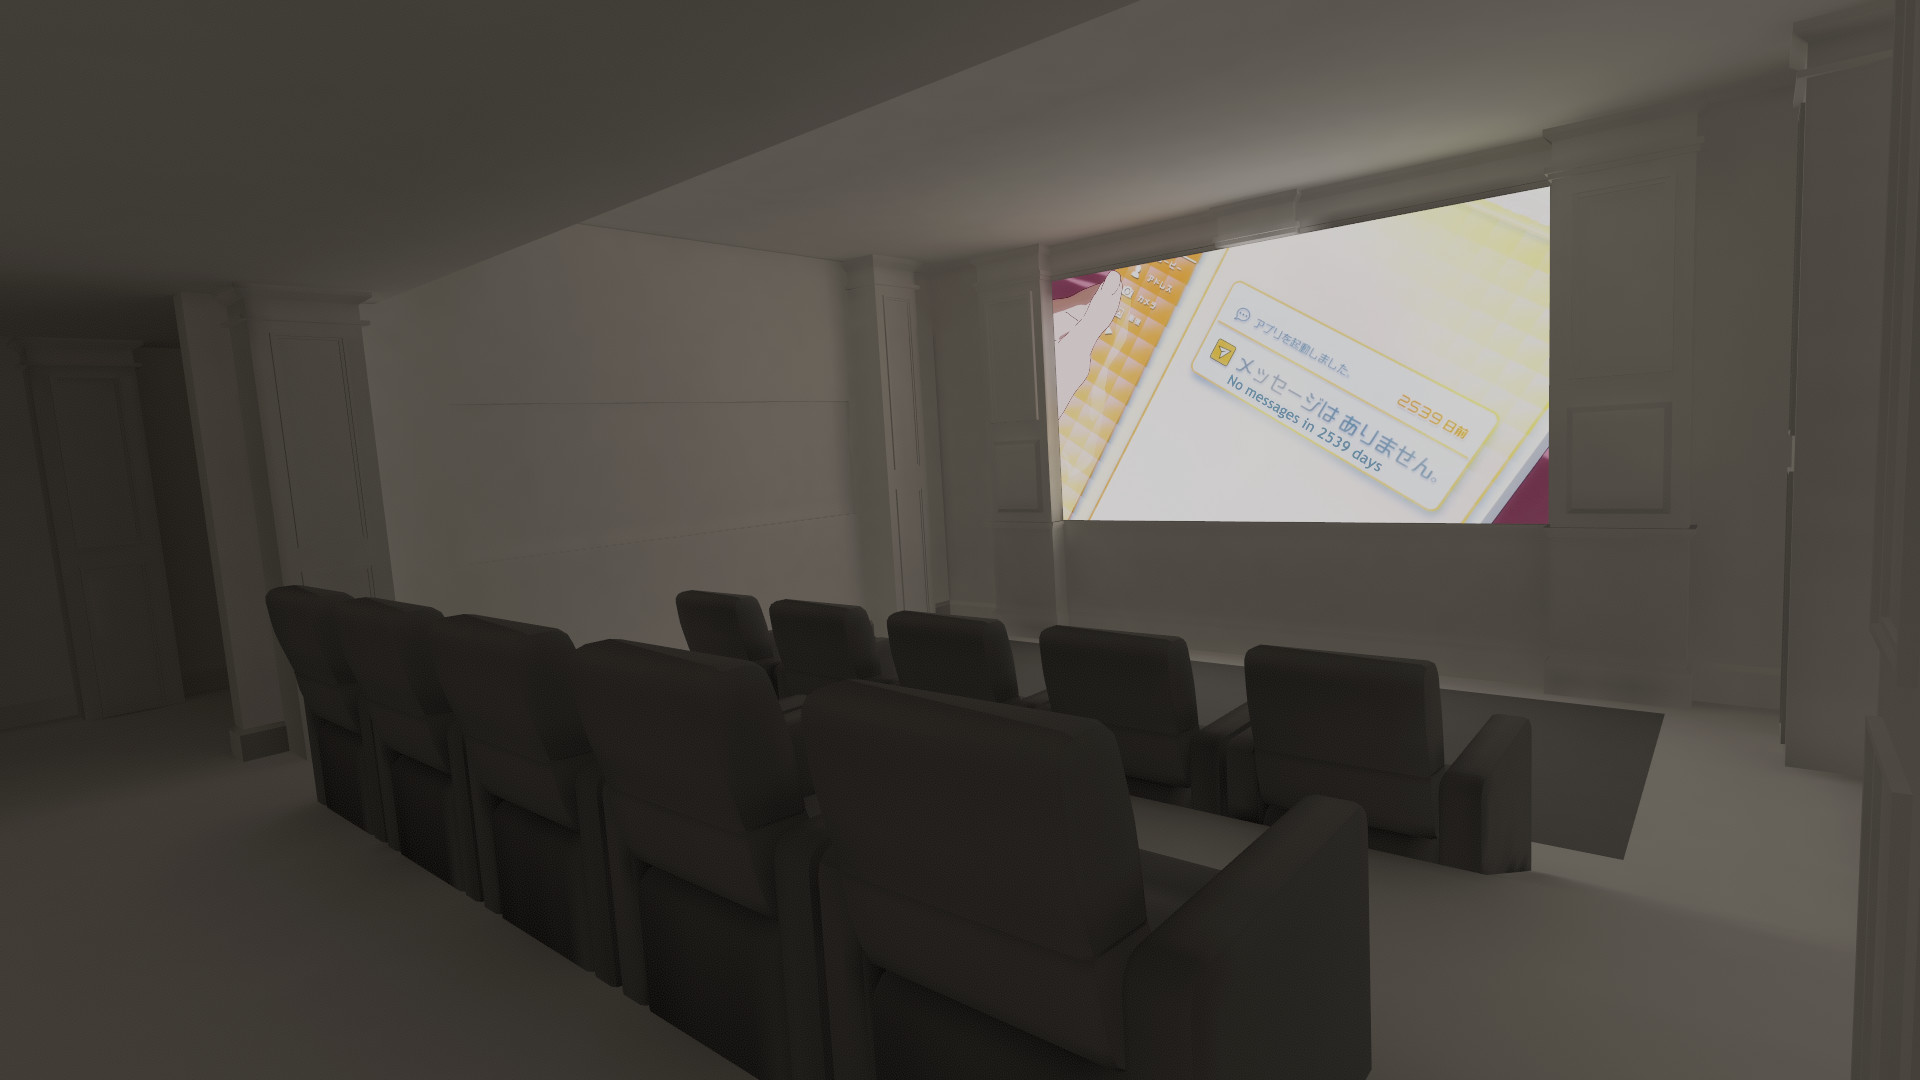 ArtStation - dynamic theater (vrchat), james tedford